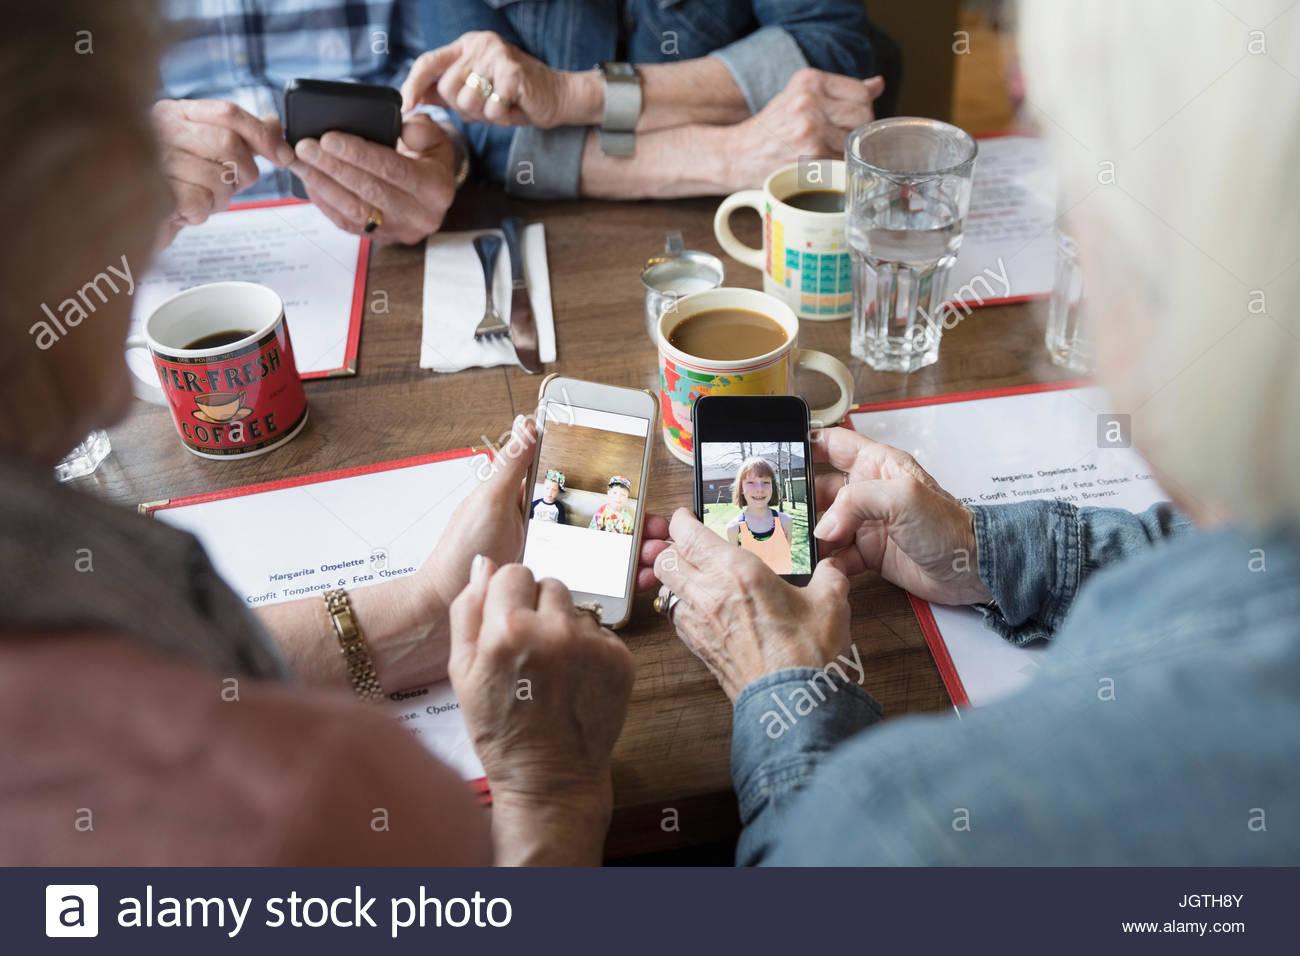 Senior women friends sharing digital photographs of grandchildren on camera phones in diner - Stock Image